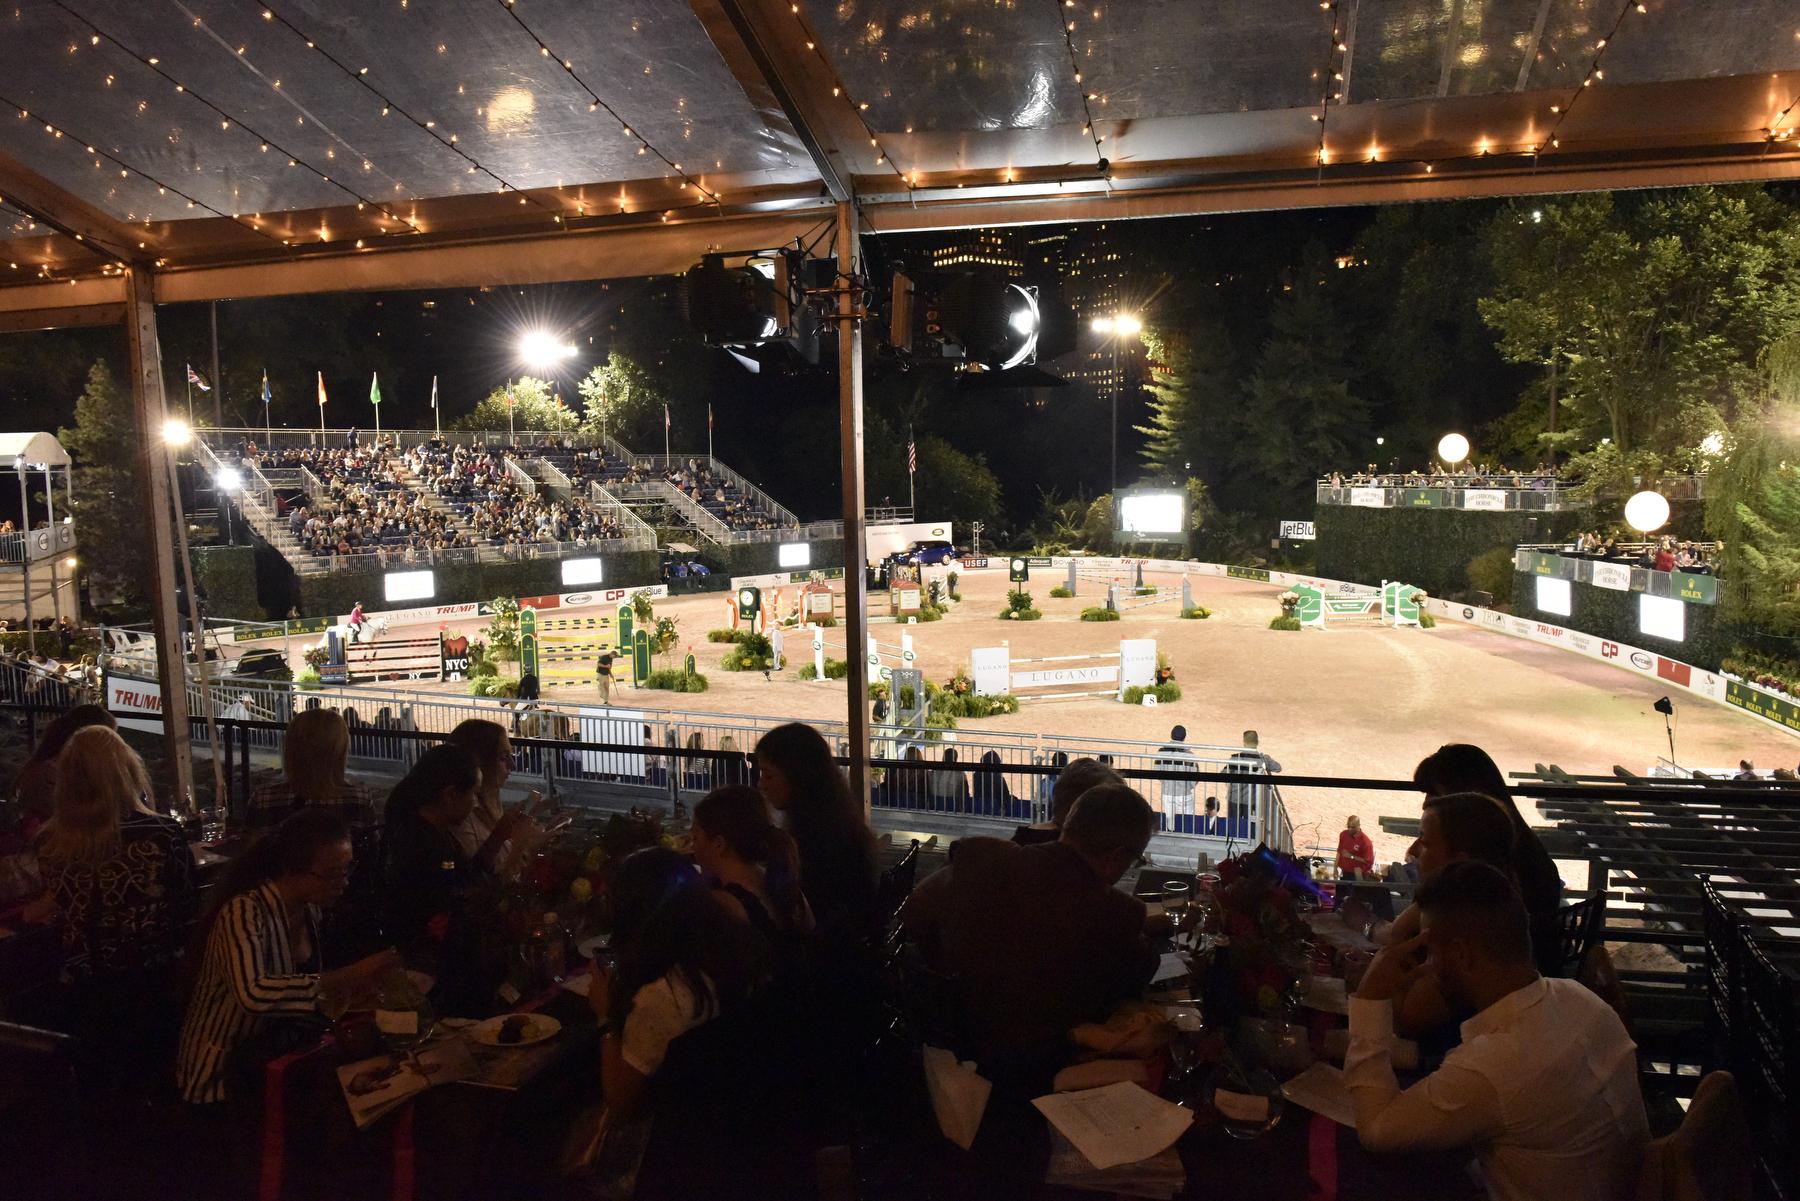 Central Park Horse Shows